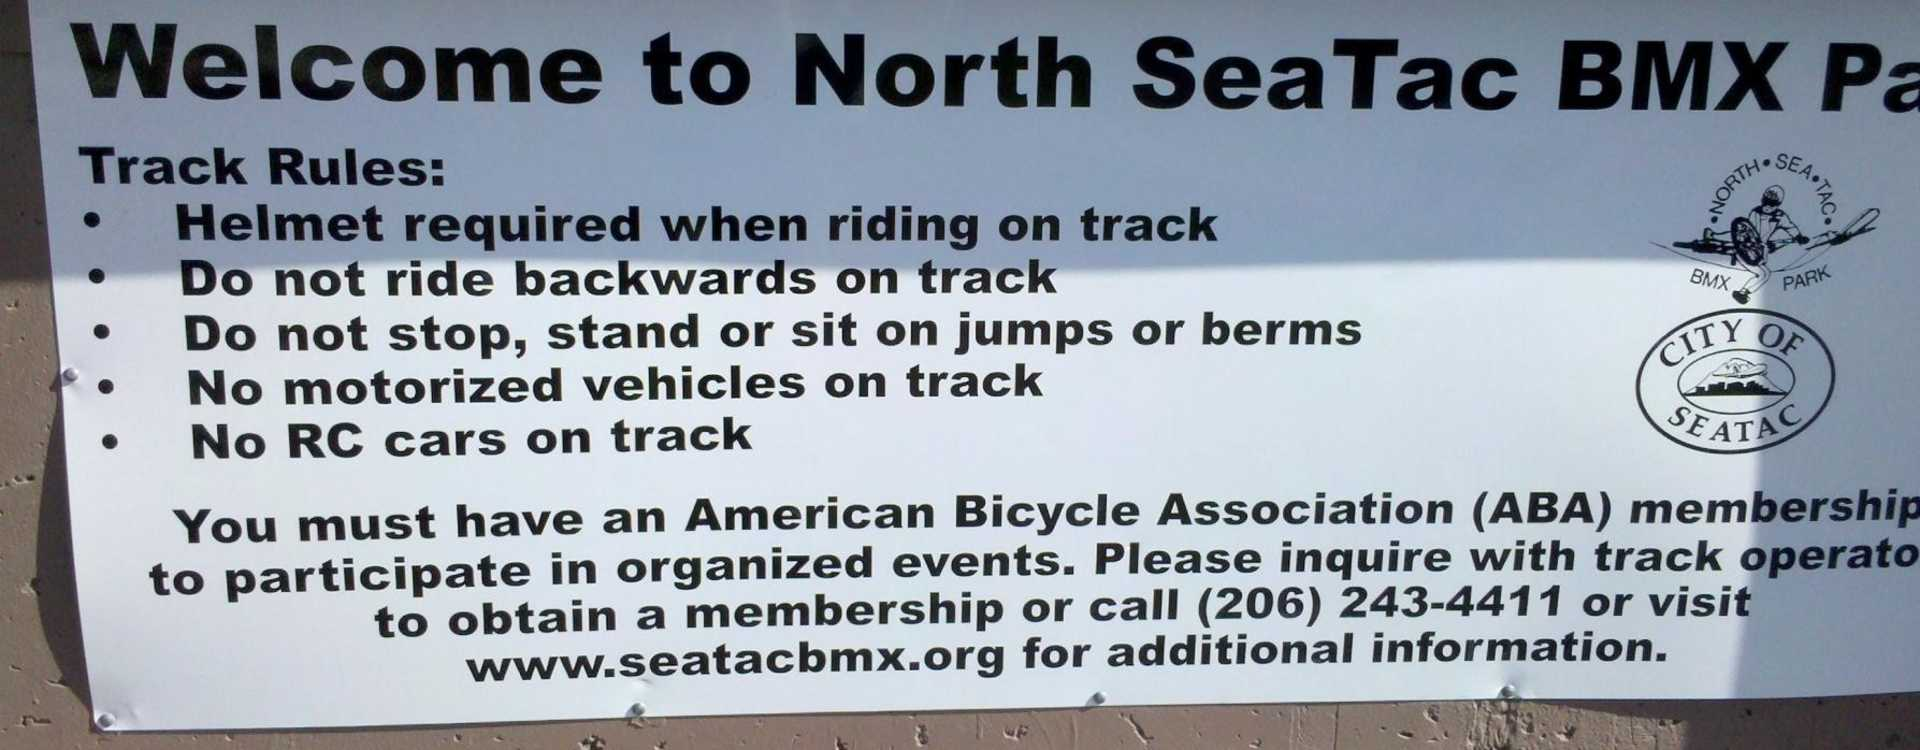 North SeaTac BMX Club